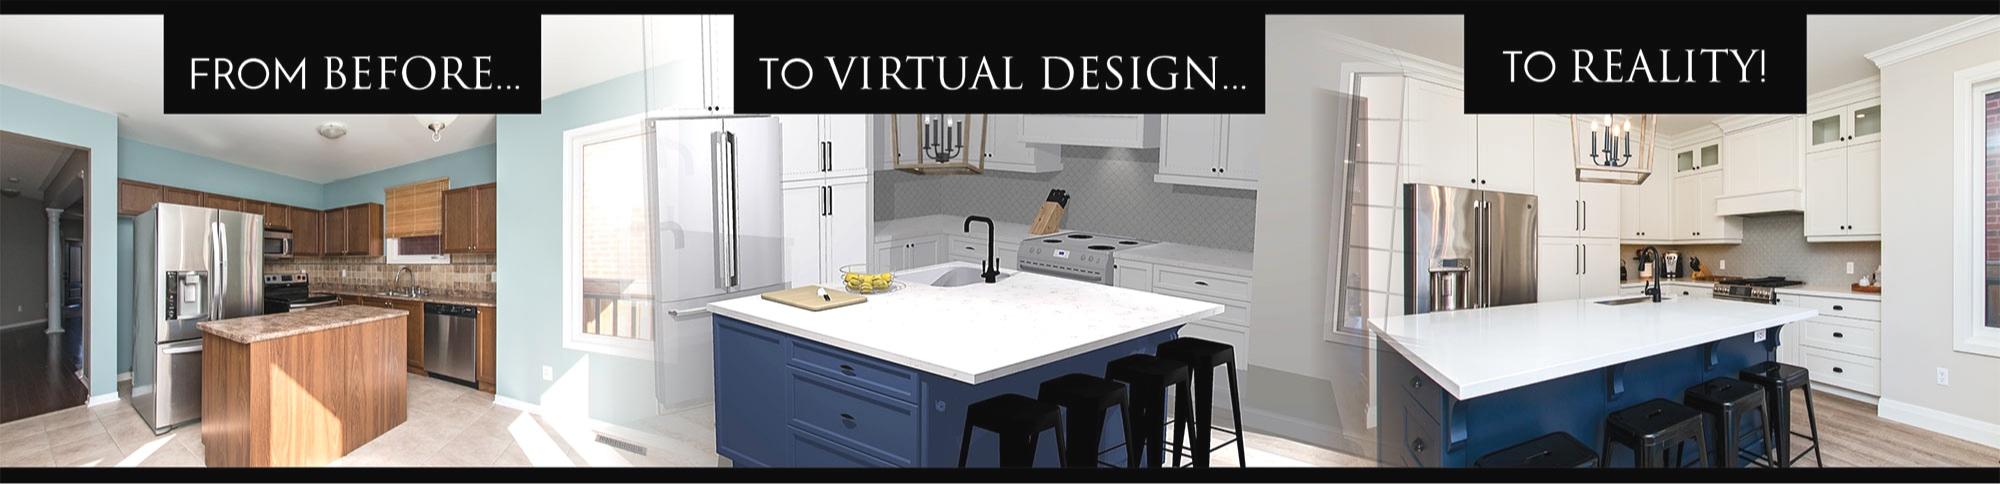 TrishaRoss-VirtualDesigntoReality.jpg